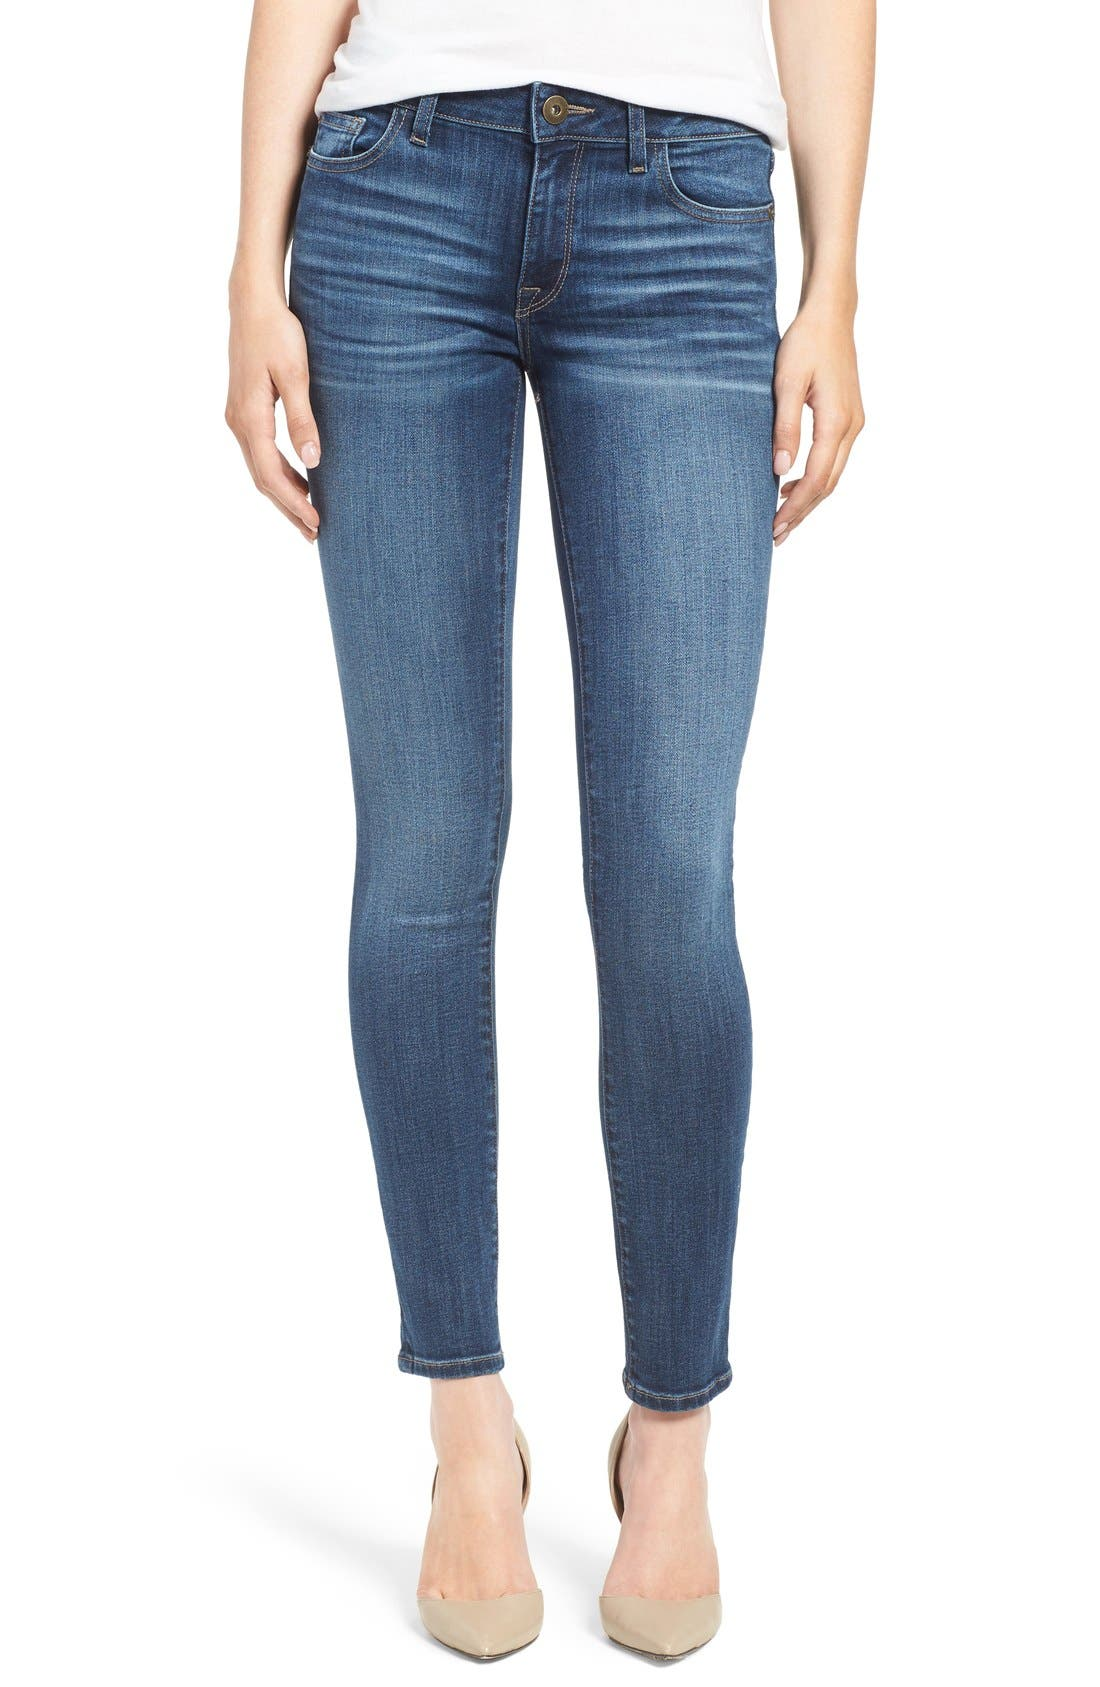 Main Image - DL1961 'Florence' Skinny Jeans (Athena)